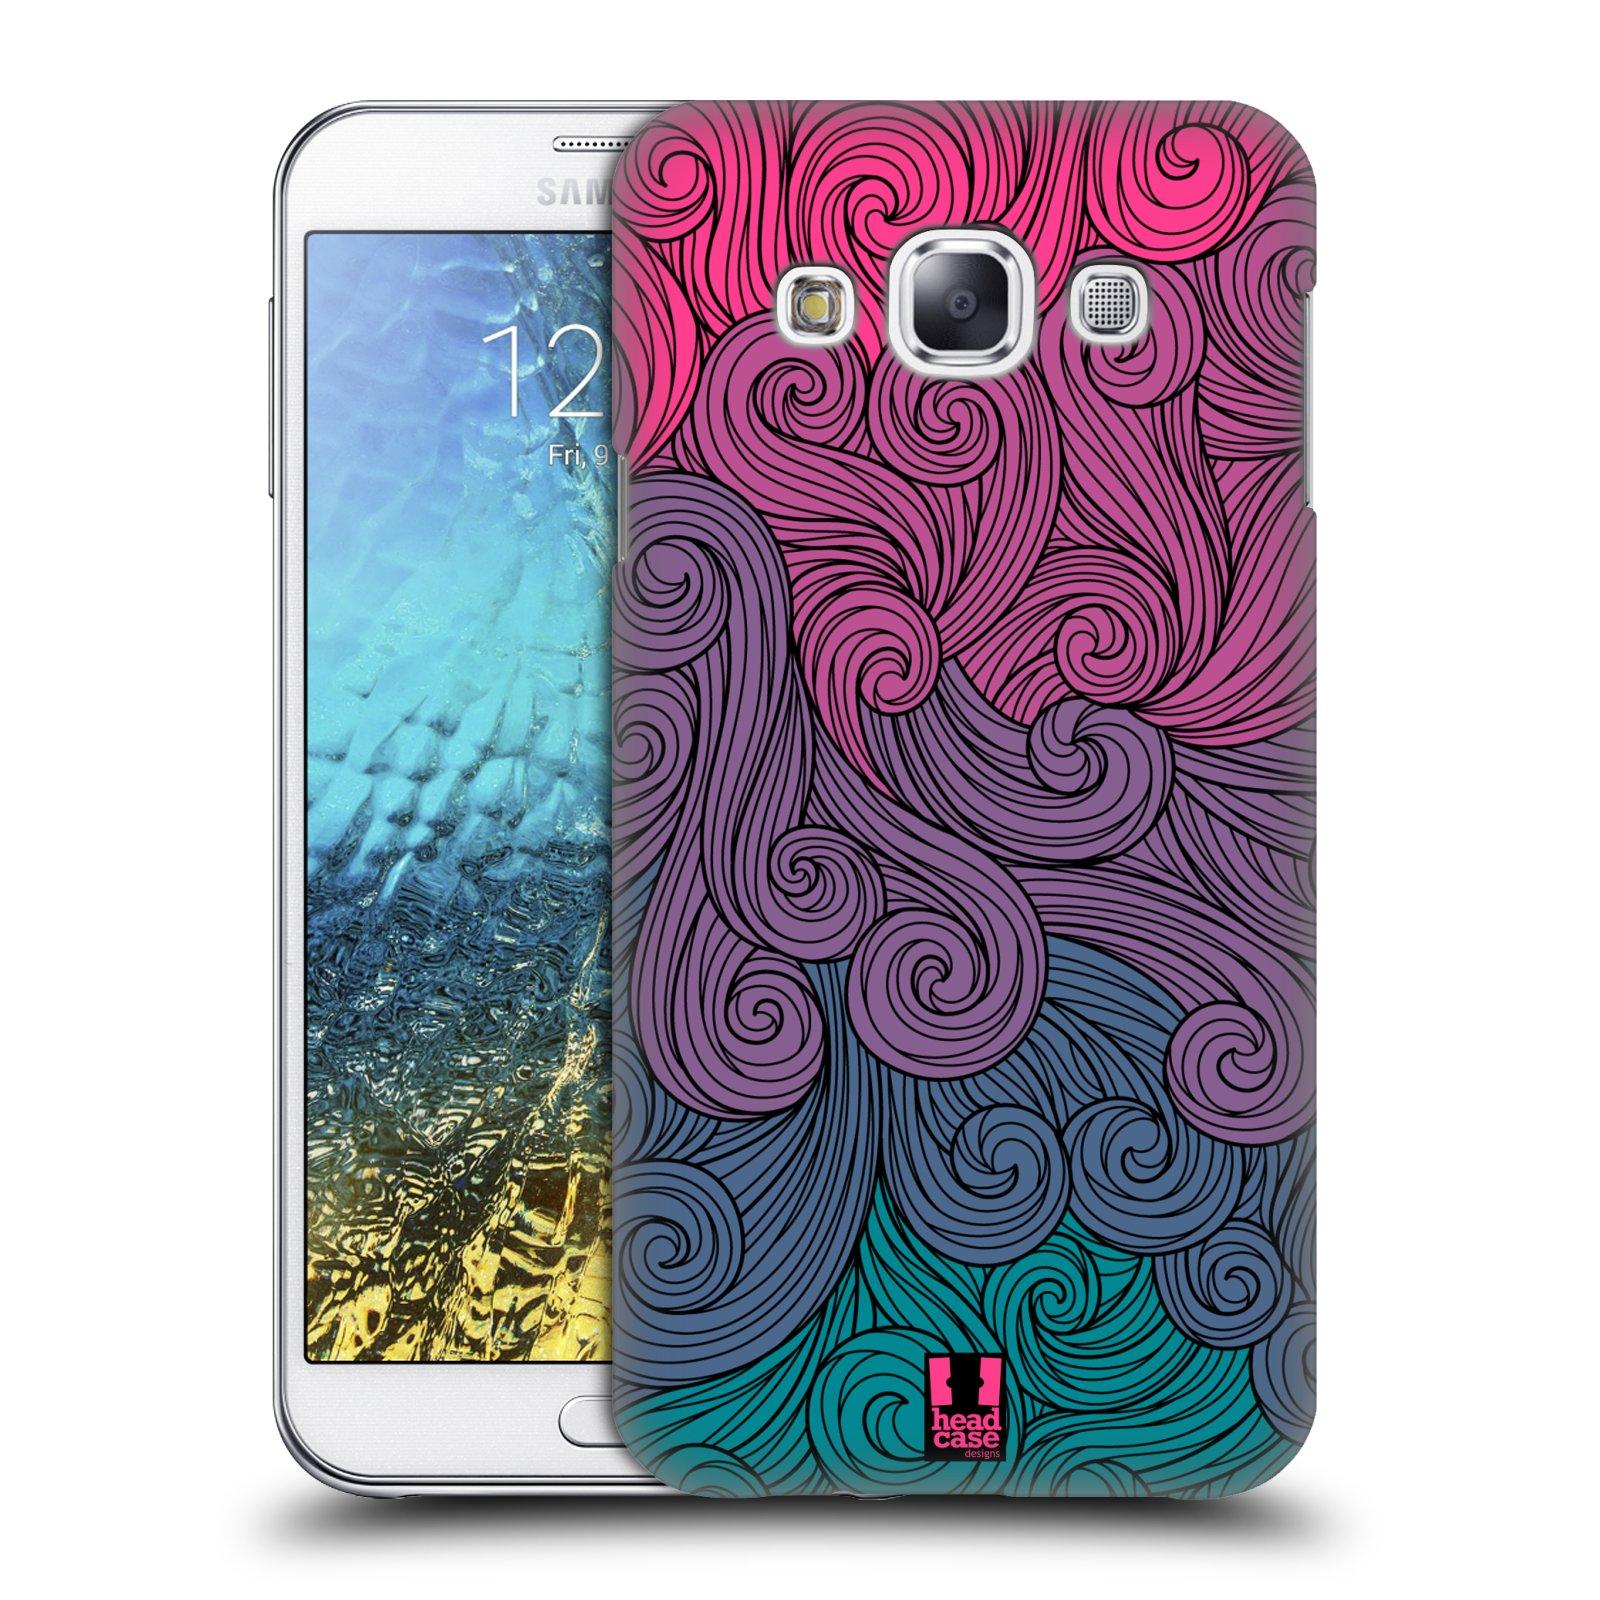 HEAD CASE DESIGNS VIVID SWIRLS HARD BACK CASE FOR SAMSUNG PHONES 3